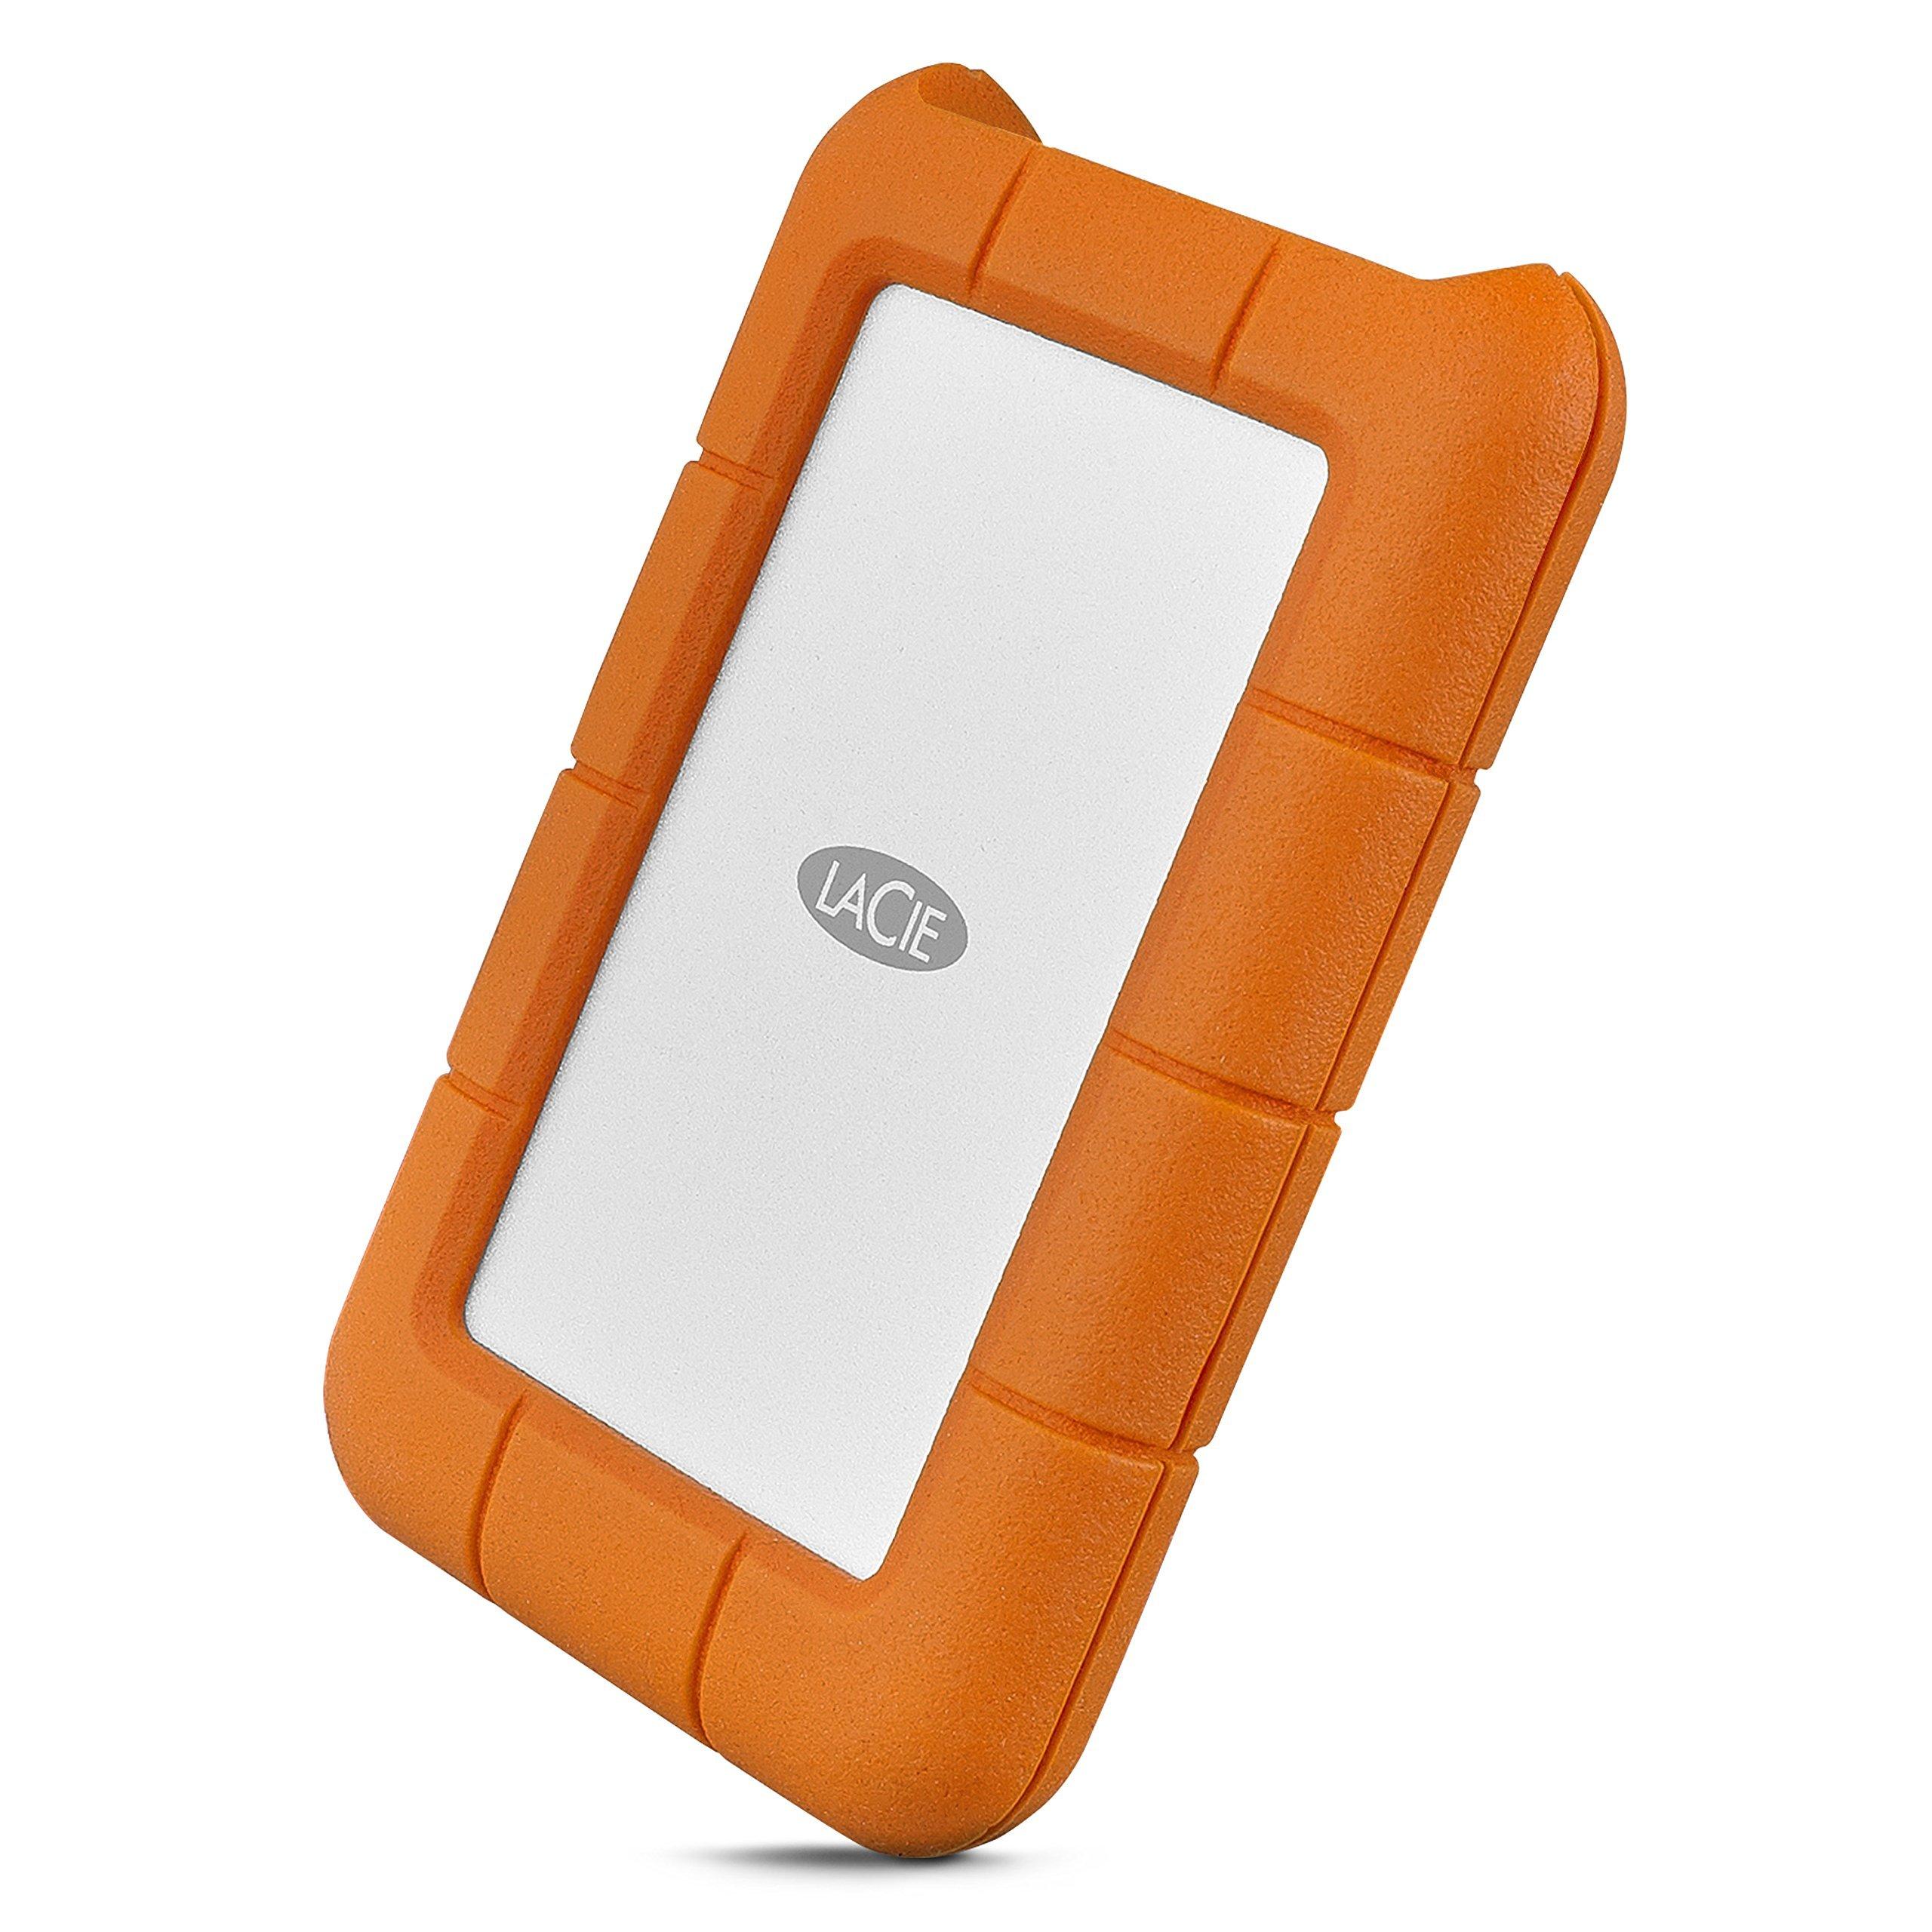 LaCie STFR1000800 1 TB 2.5in External Hard Drive - USB Type C - Desktop (Renewed)